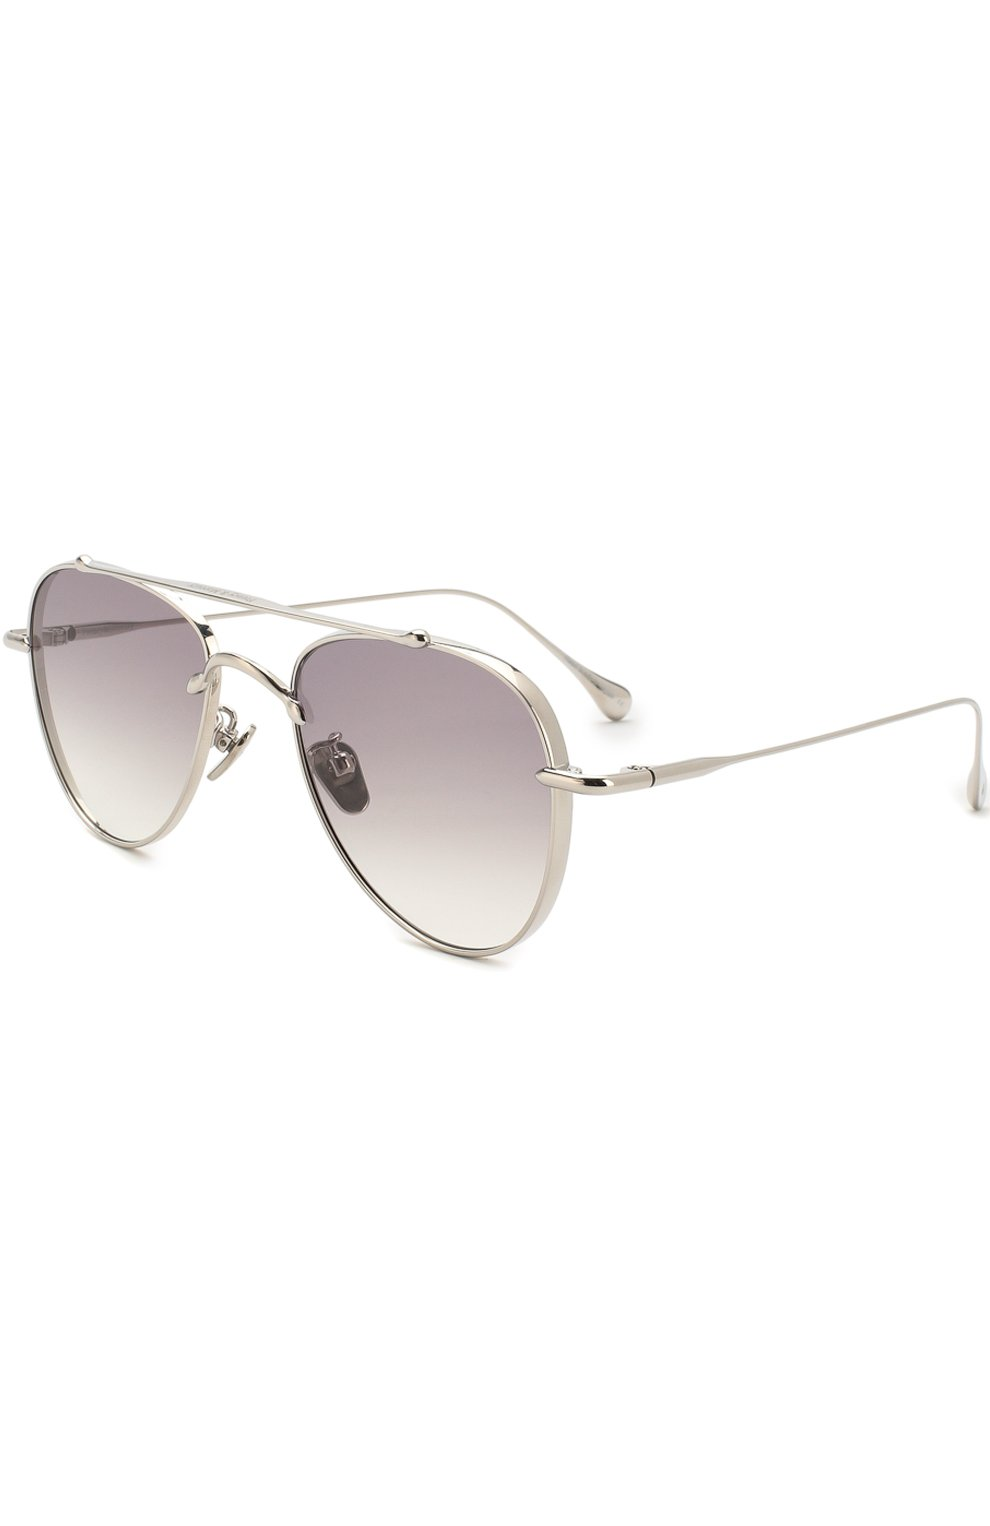 Женские солнцезащитные очки FRENCY&MERCURY серебряного цвета, арт. EG0ISTIC SUNDAY III/SS | Фото 1